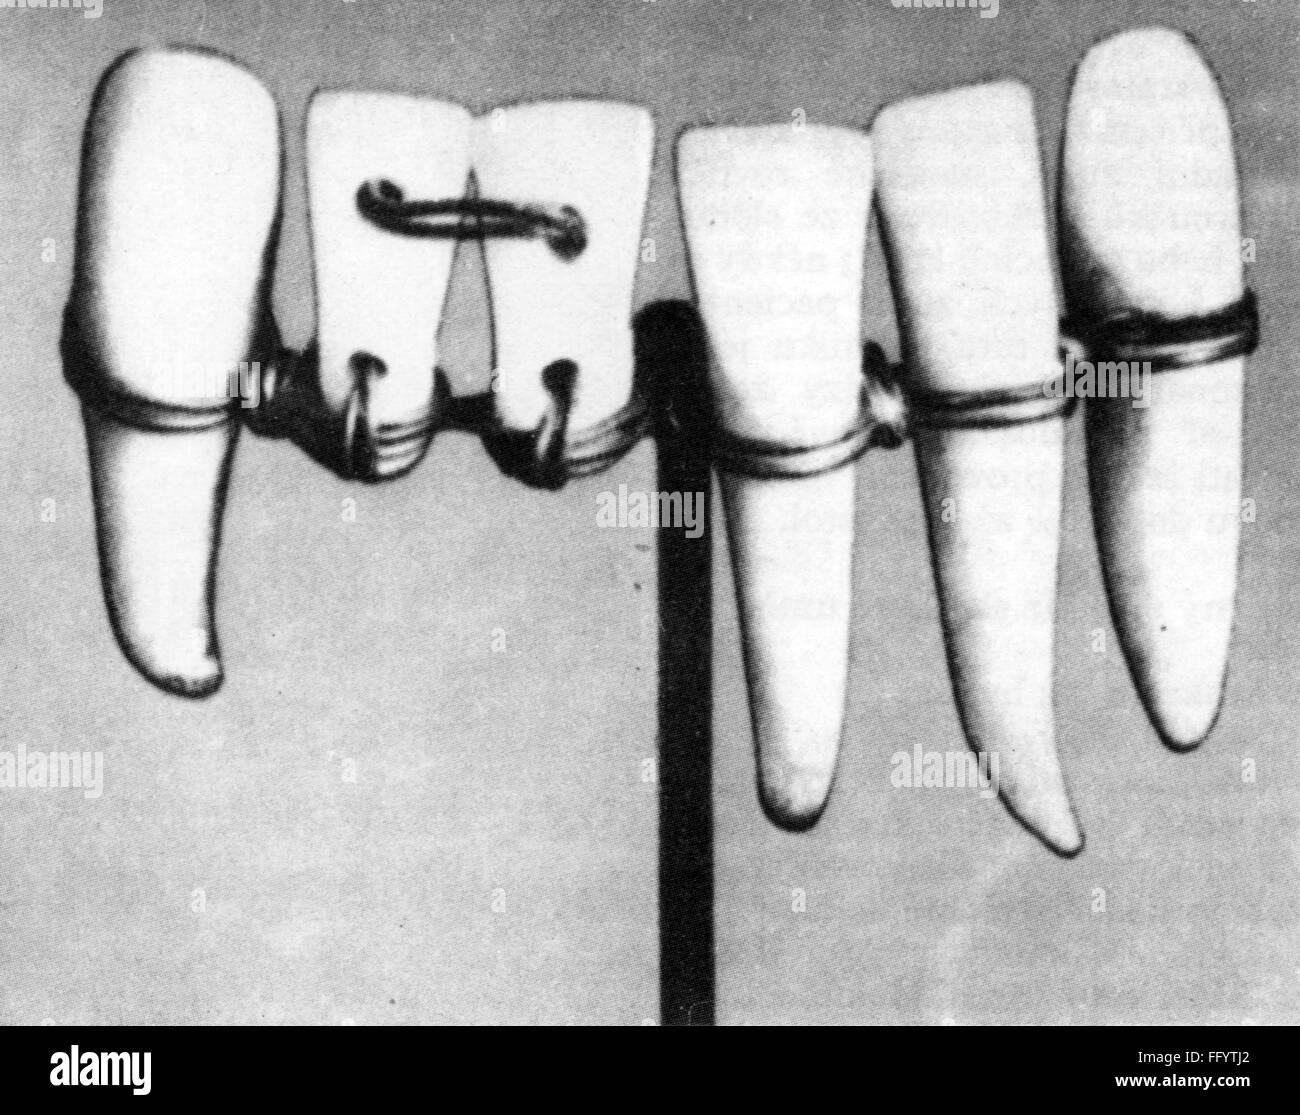 medicine, dentistry, denture, 19th / 20th century, 19th century, 20th century, tooth, prosthesis, prostheses, set - Stock Image